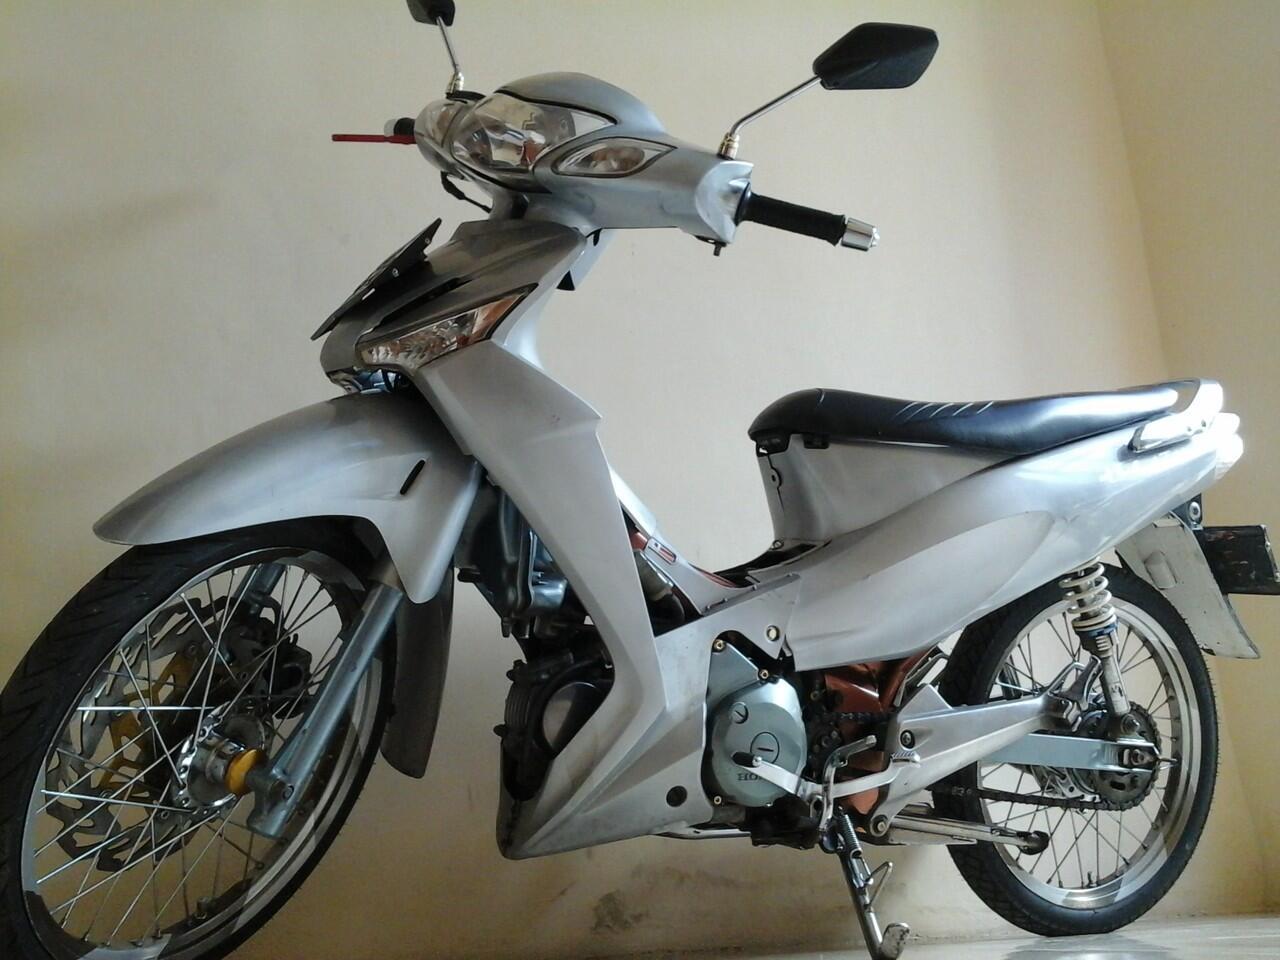 Terjual Honda Karisma X 125 KASKUS